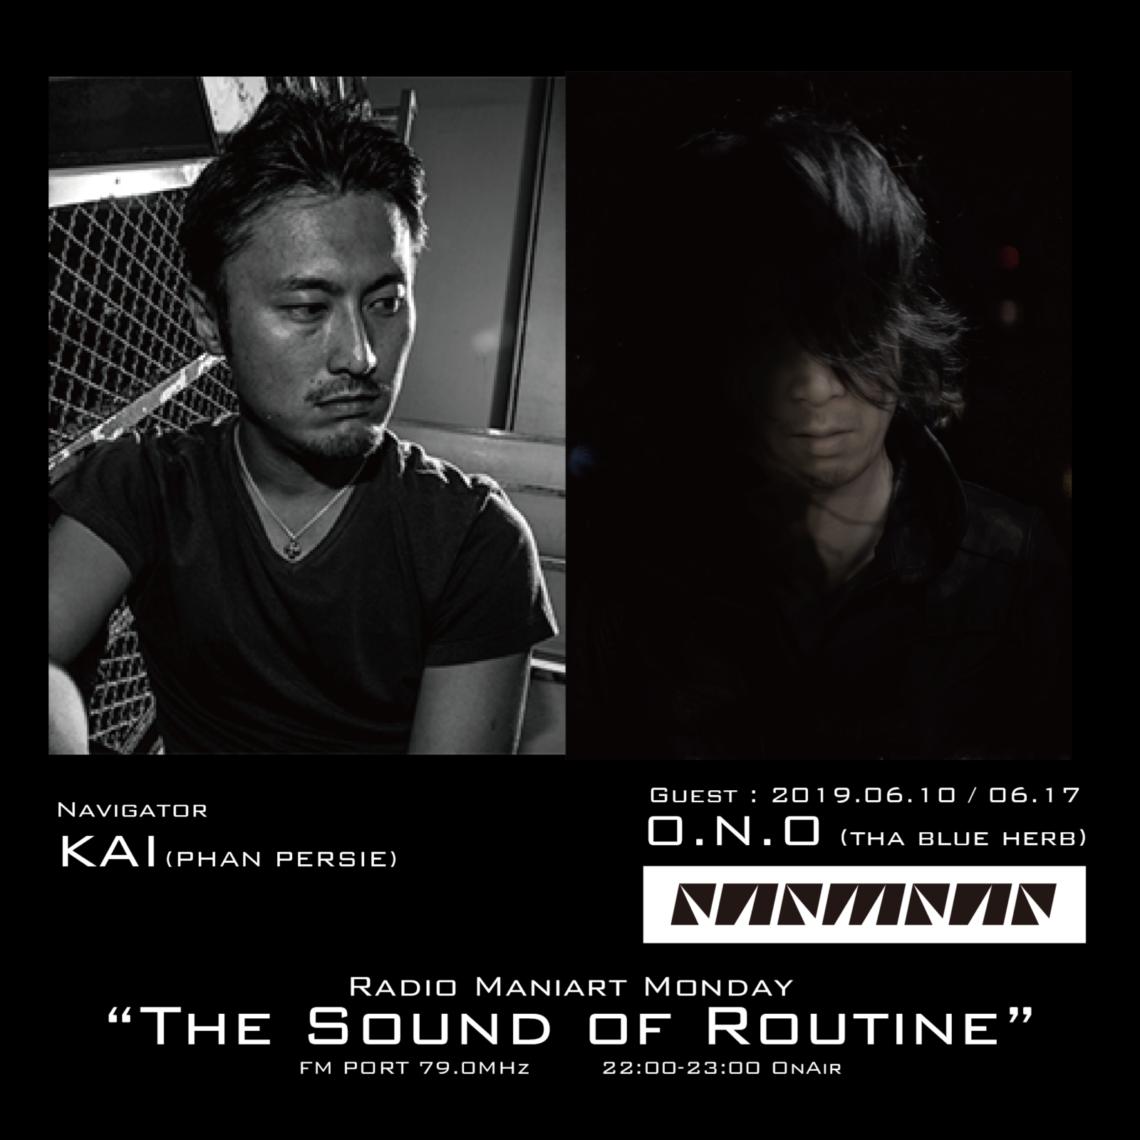 2019. 6. 10 MON, 17 MON – KAI : Navigator on FM PORT / the Sound of Routine – Guest: O.N.O(THA BLUE HERB)